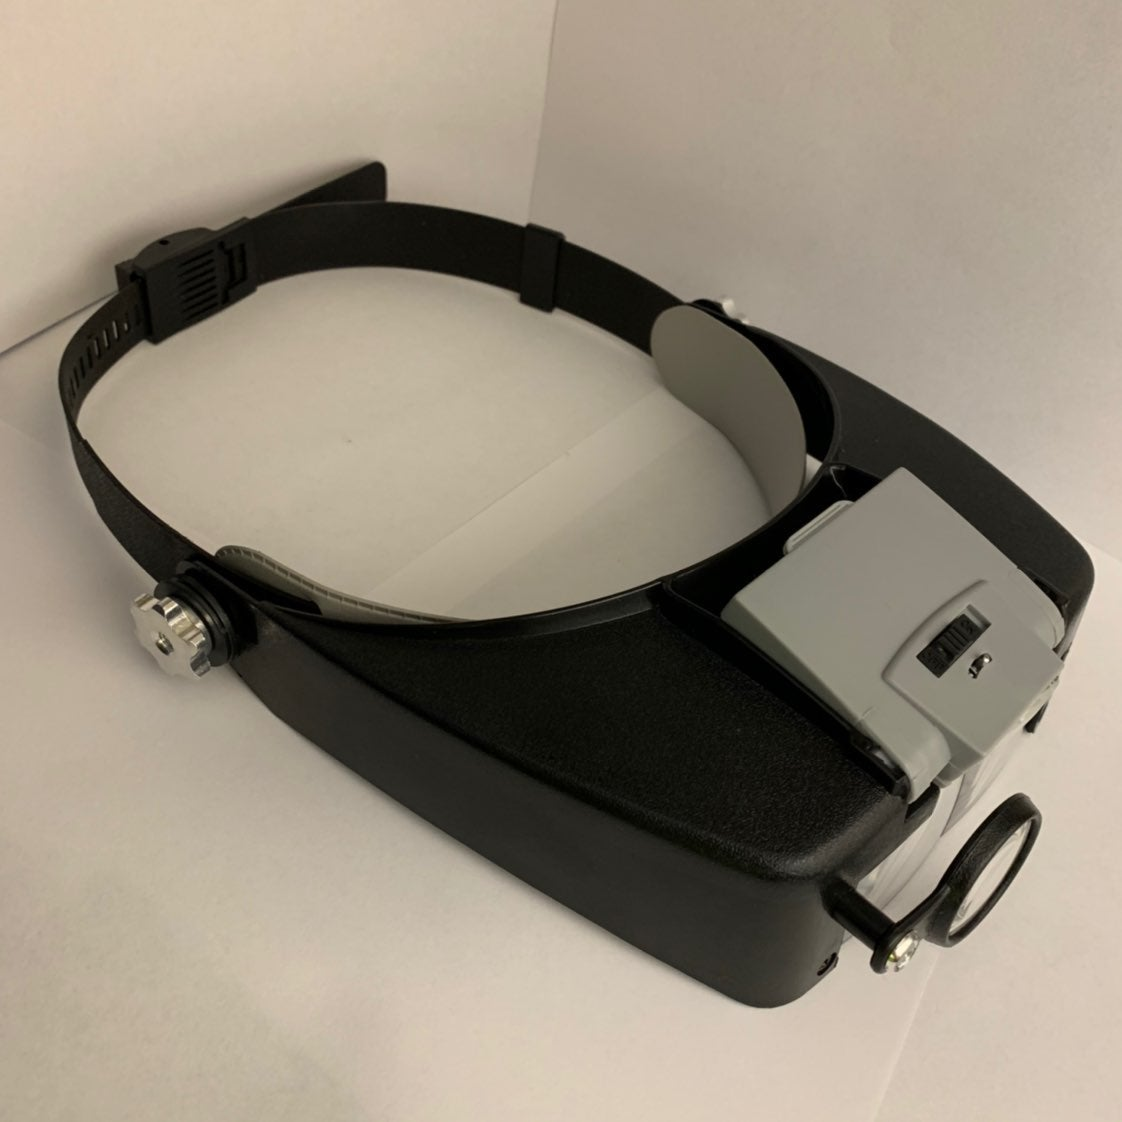 Jeweler's Magnifying Headband